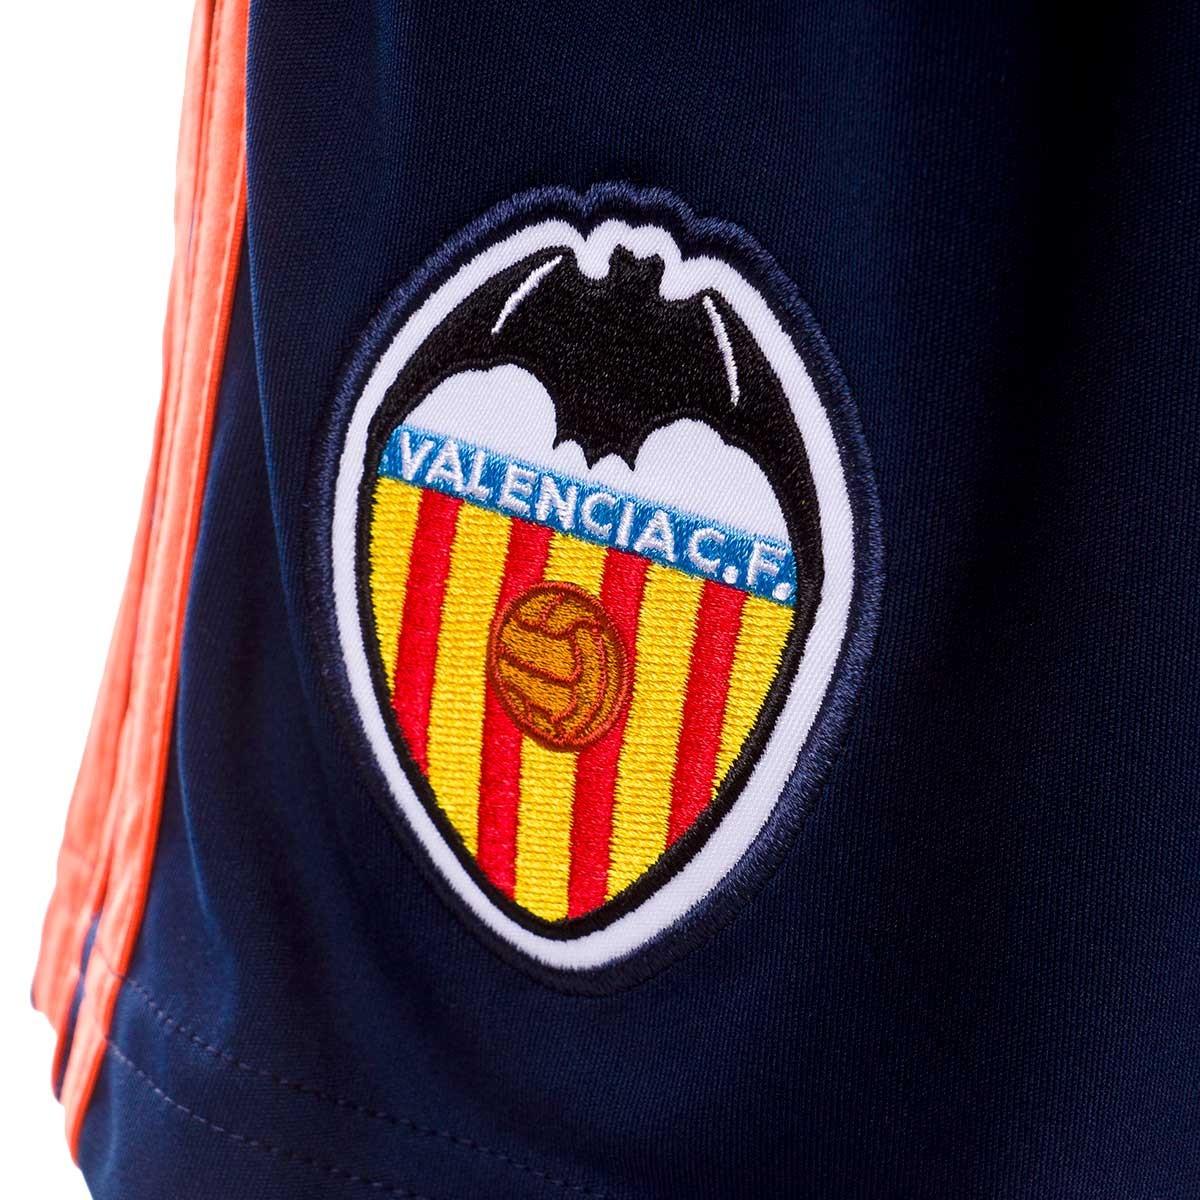 2019 2018 Semi Valencia Collegiate Away Navy Pantaloncini Adidas Cf qIXfXwC